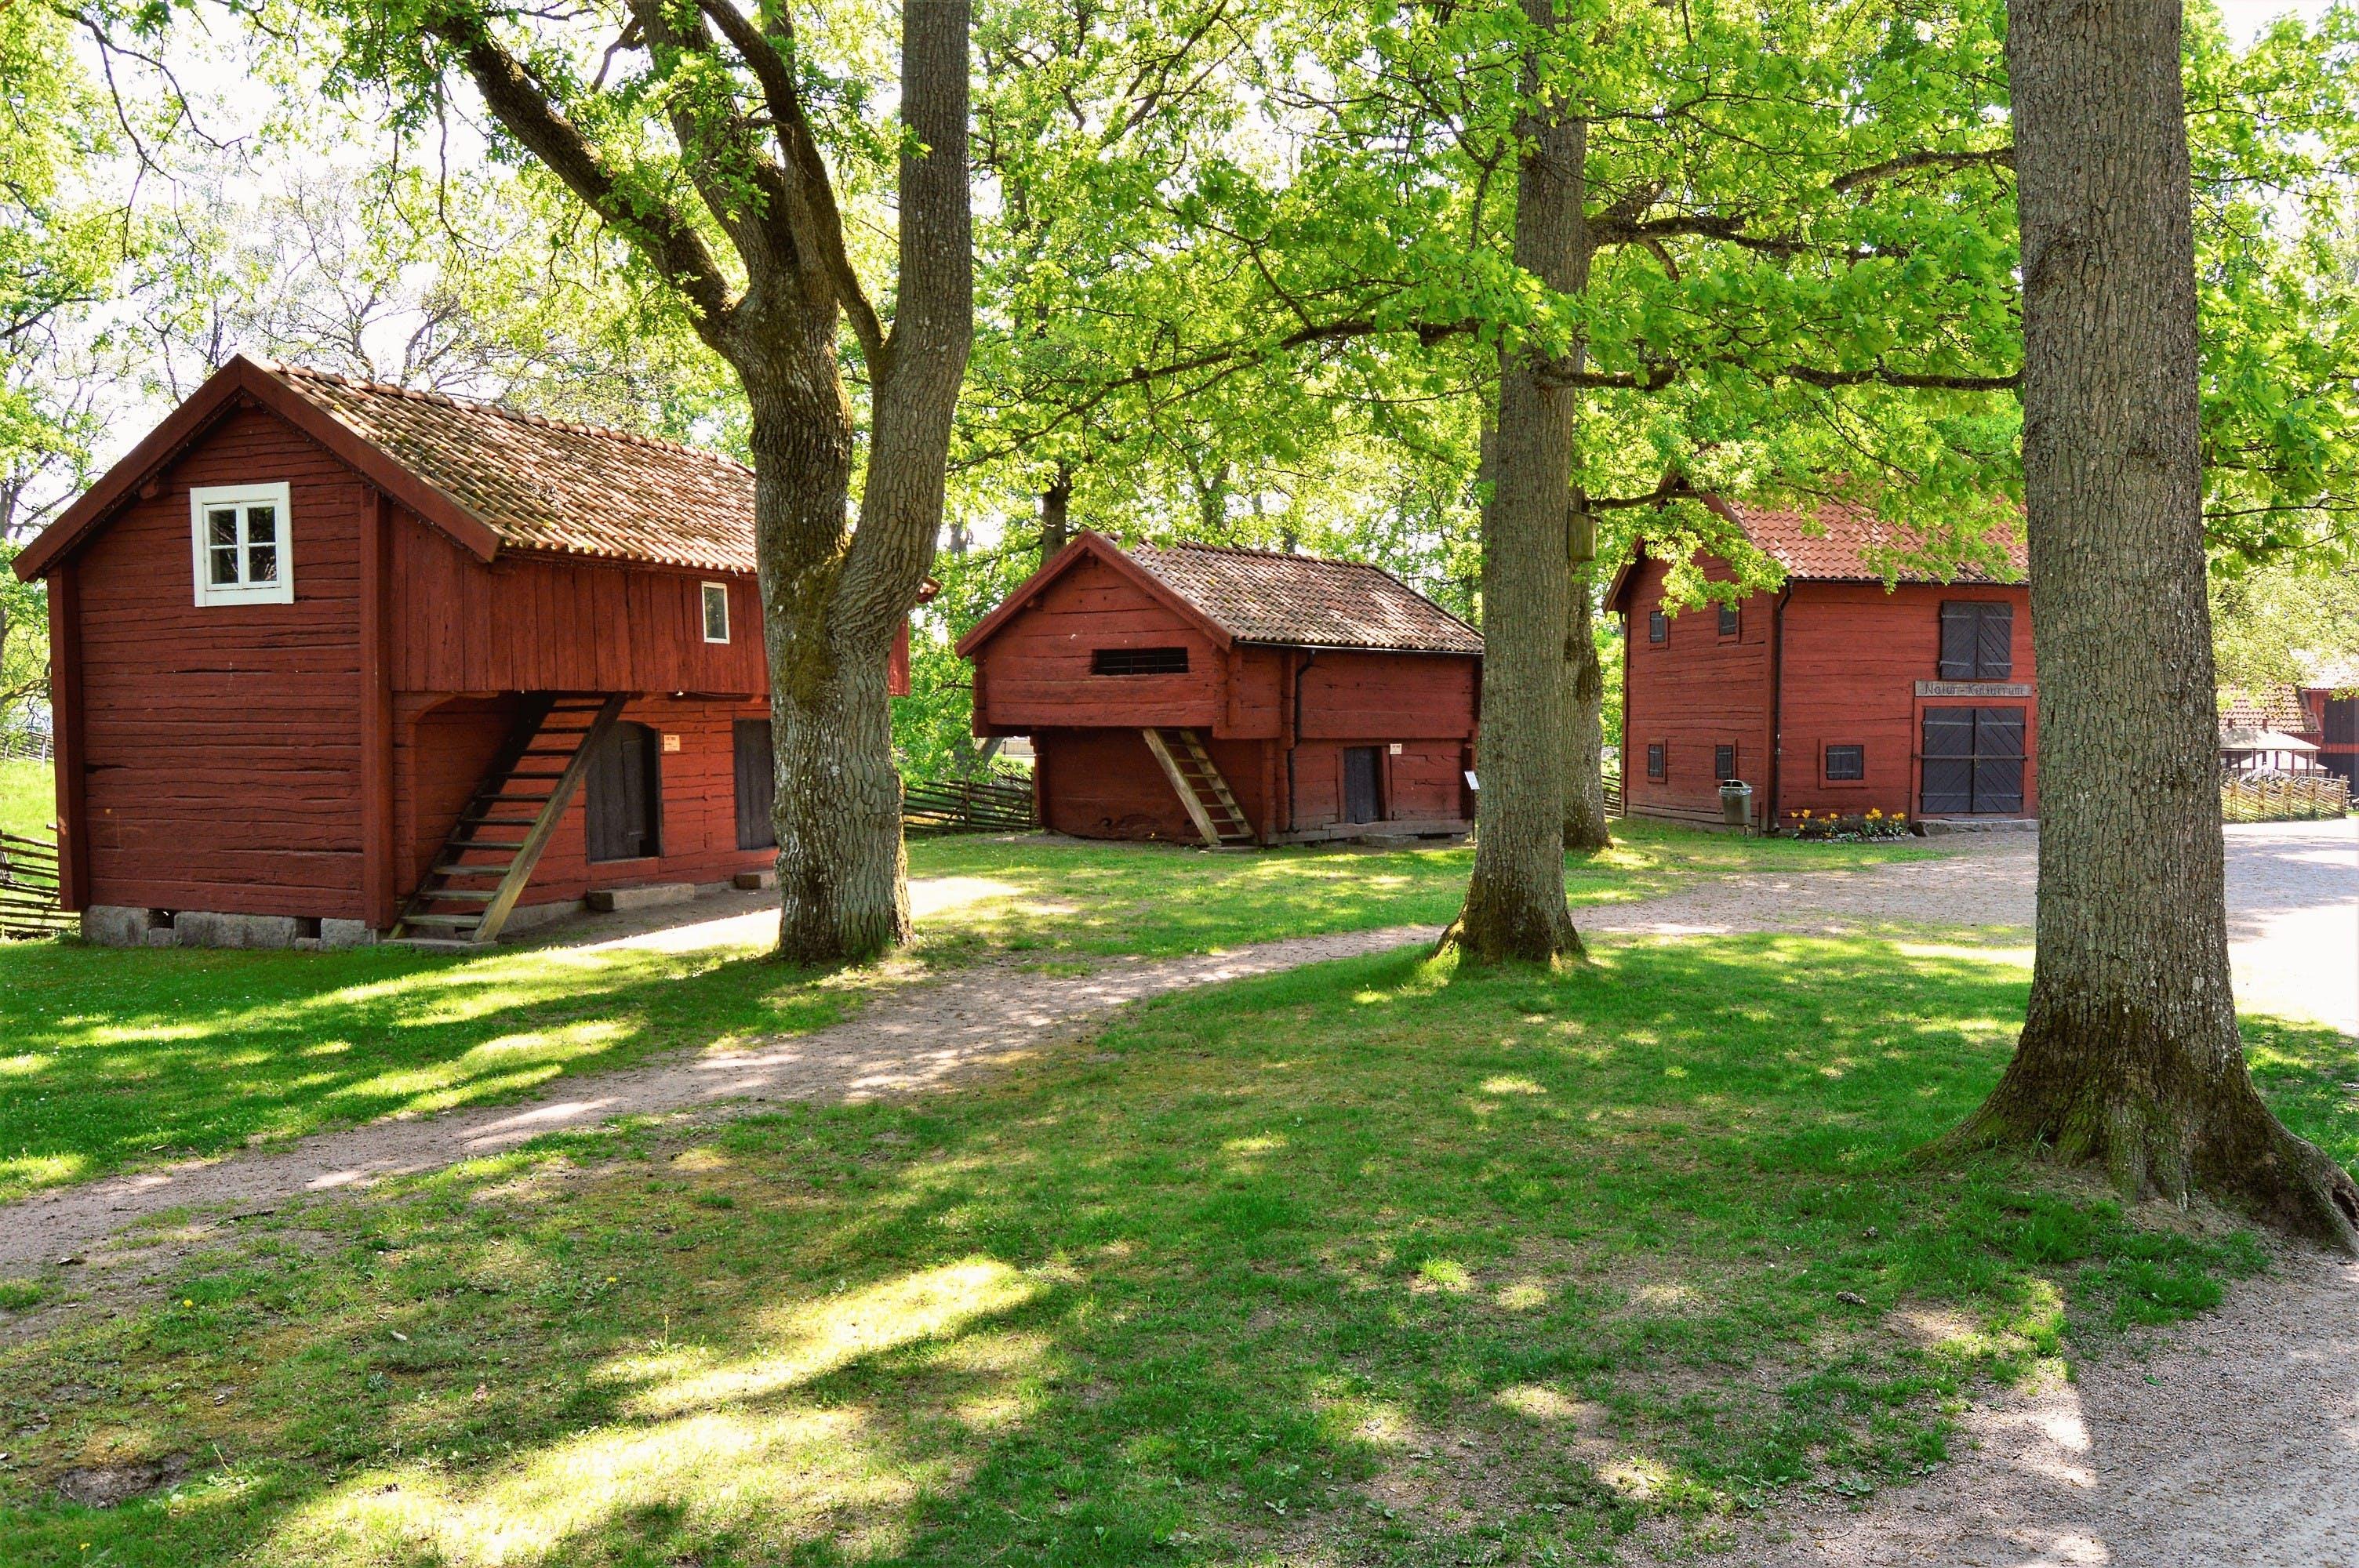 Three Brown Wooden Cabins